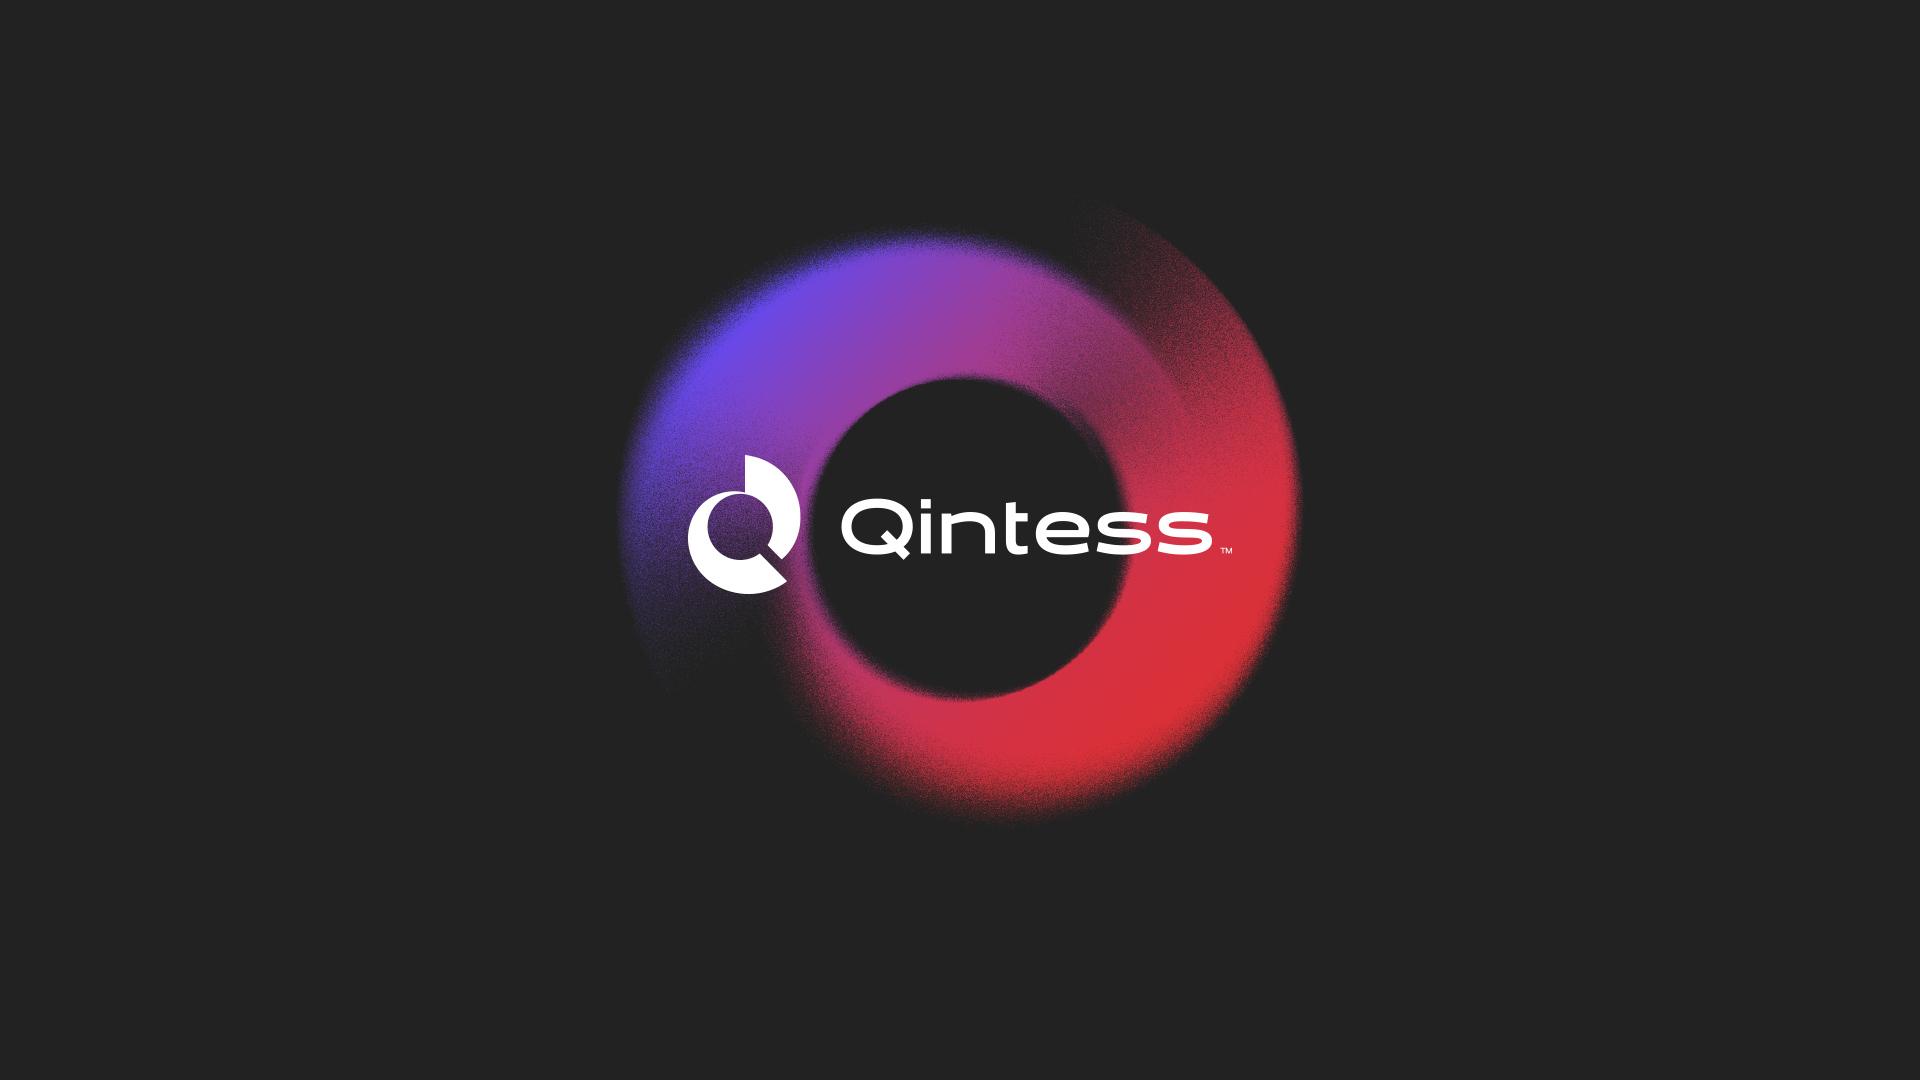 GH Branding Creates Brand for Qintess